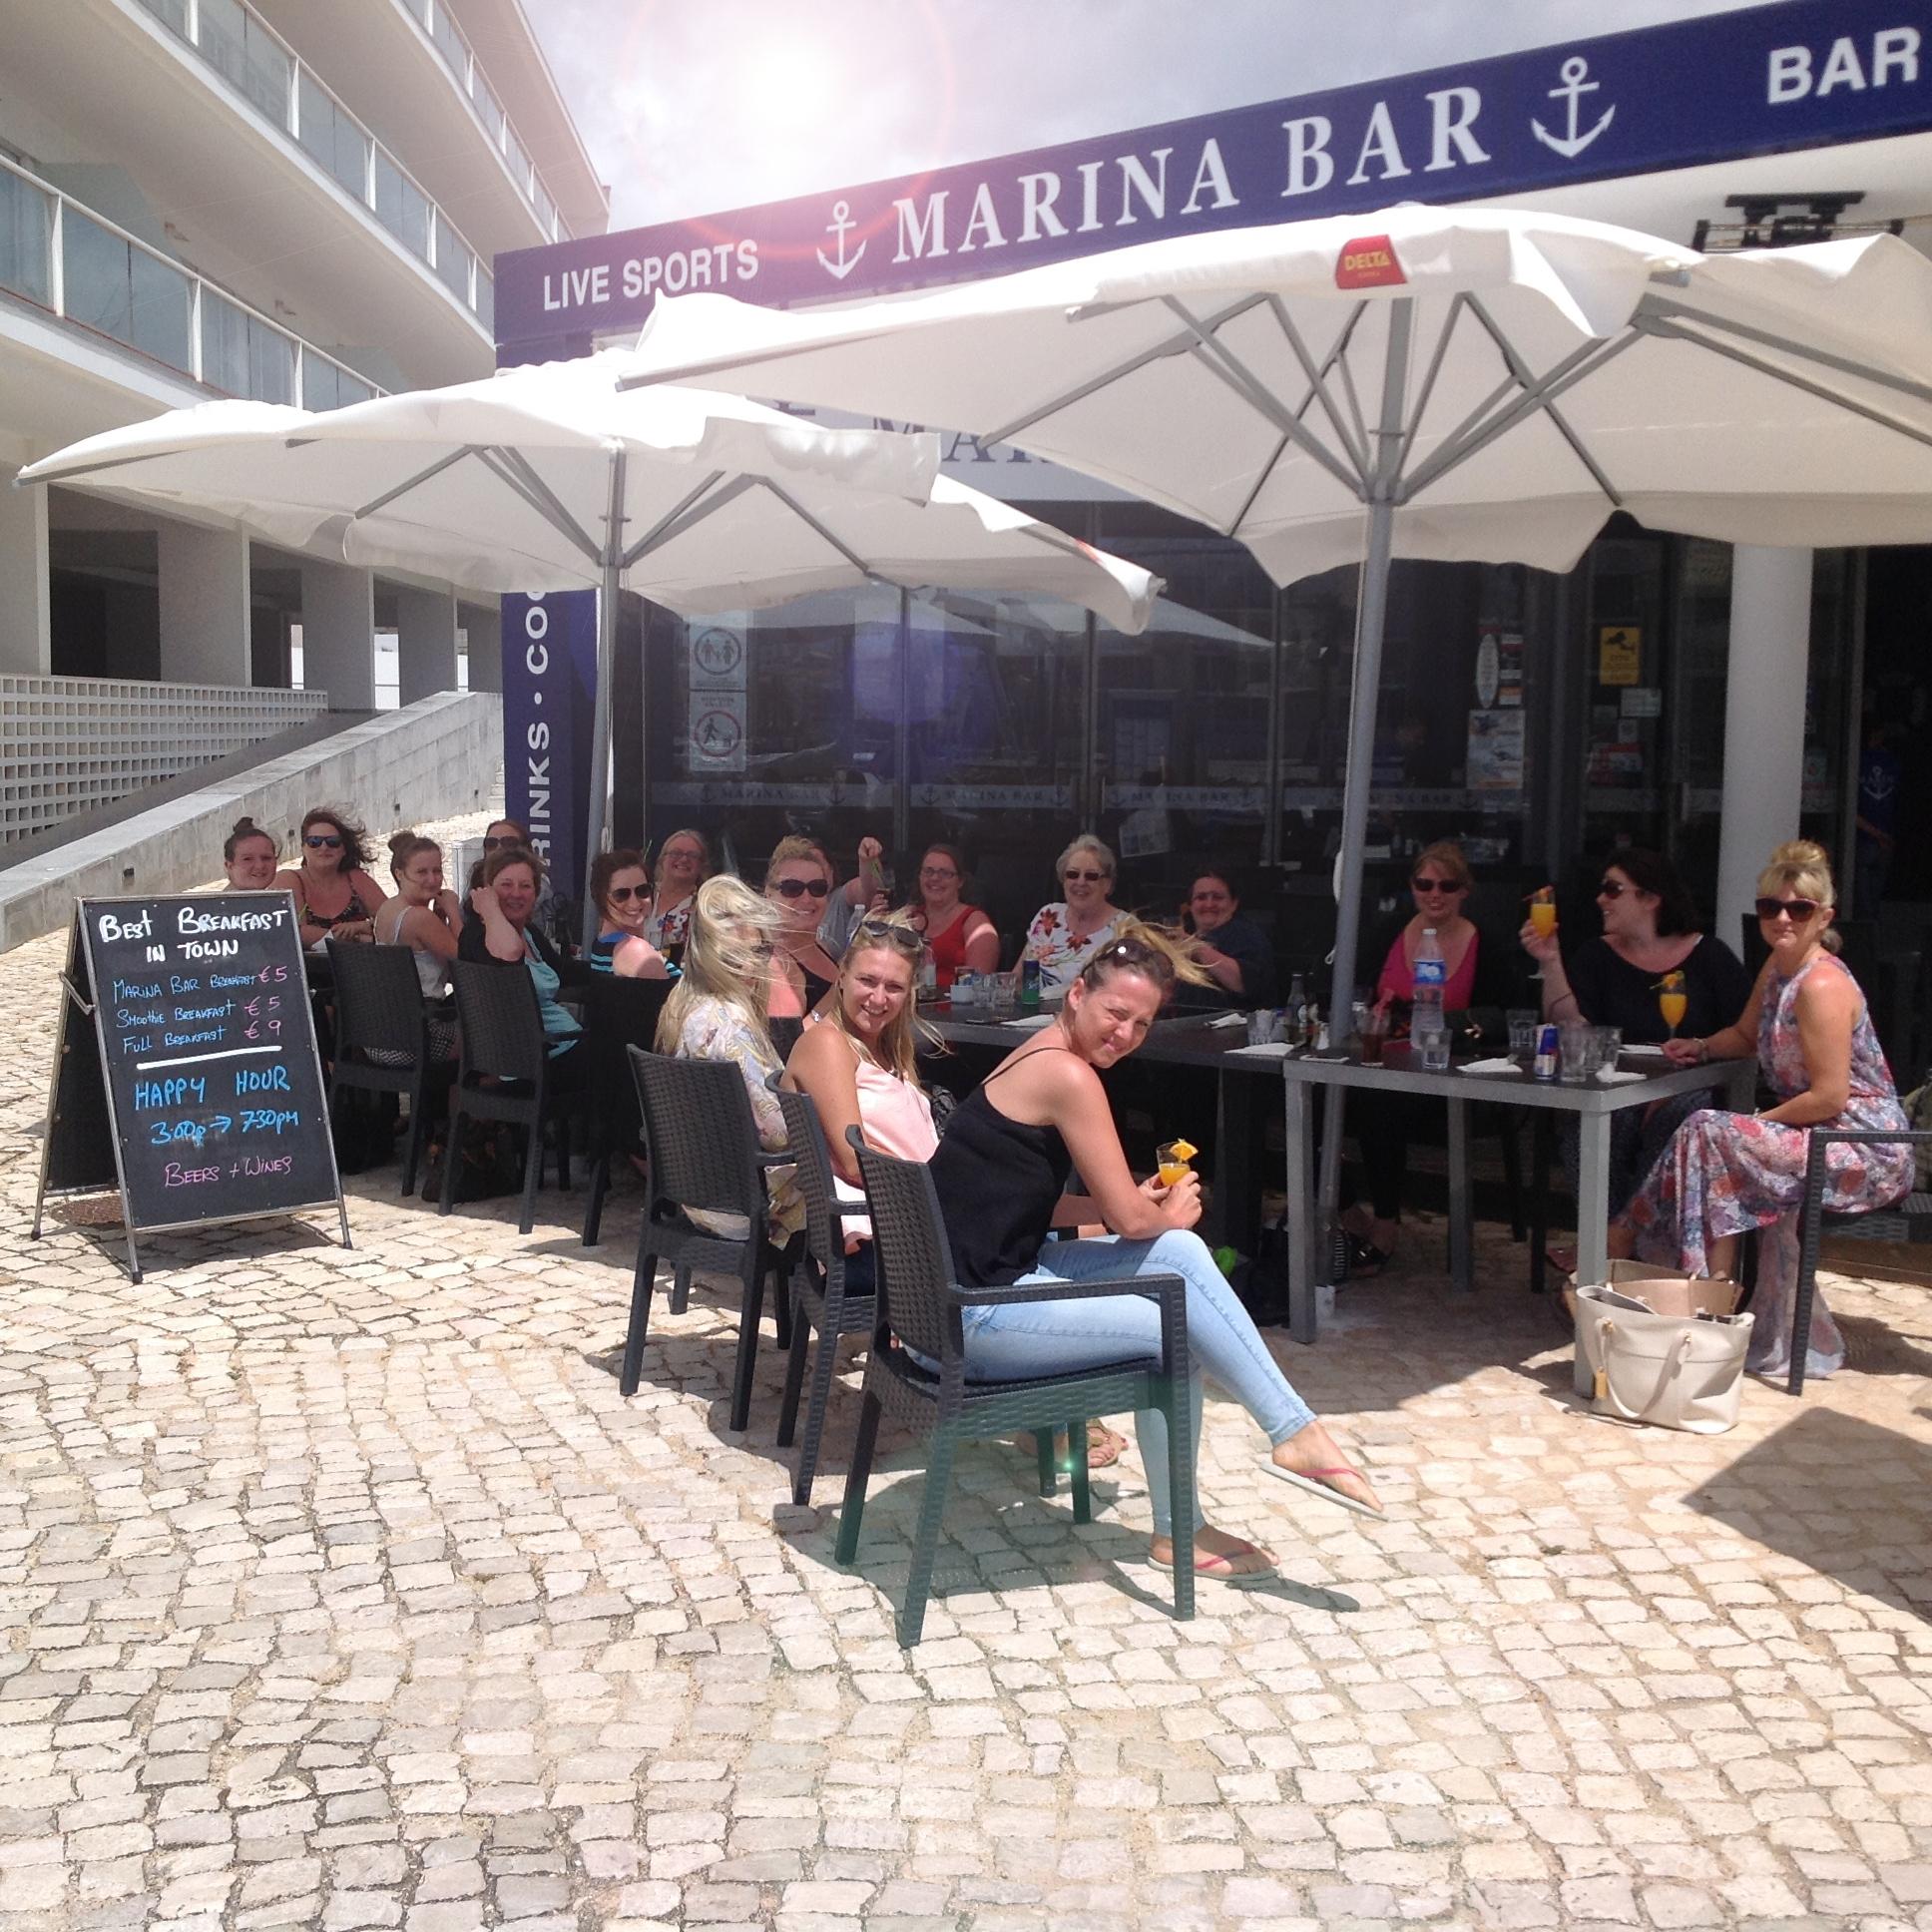 Marina Bar Lagos Outside 1 (2) - Sports Bar and Restaurant Bar Lagos Algarve portugal